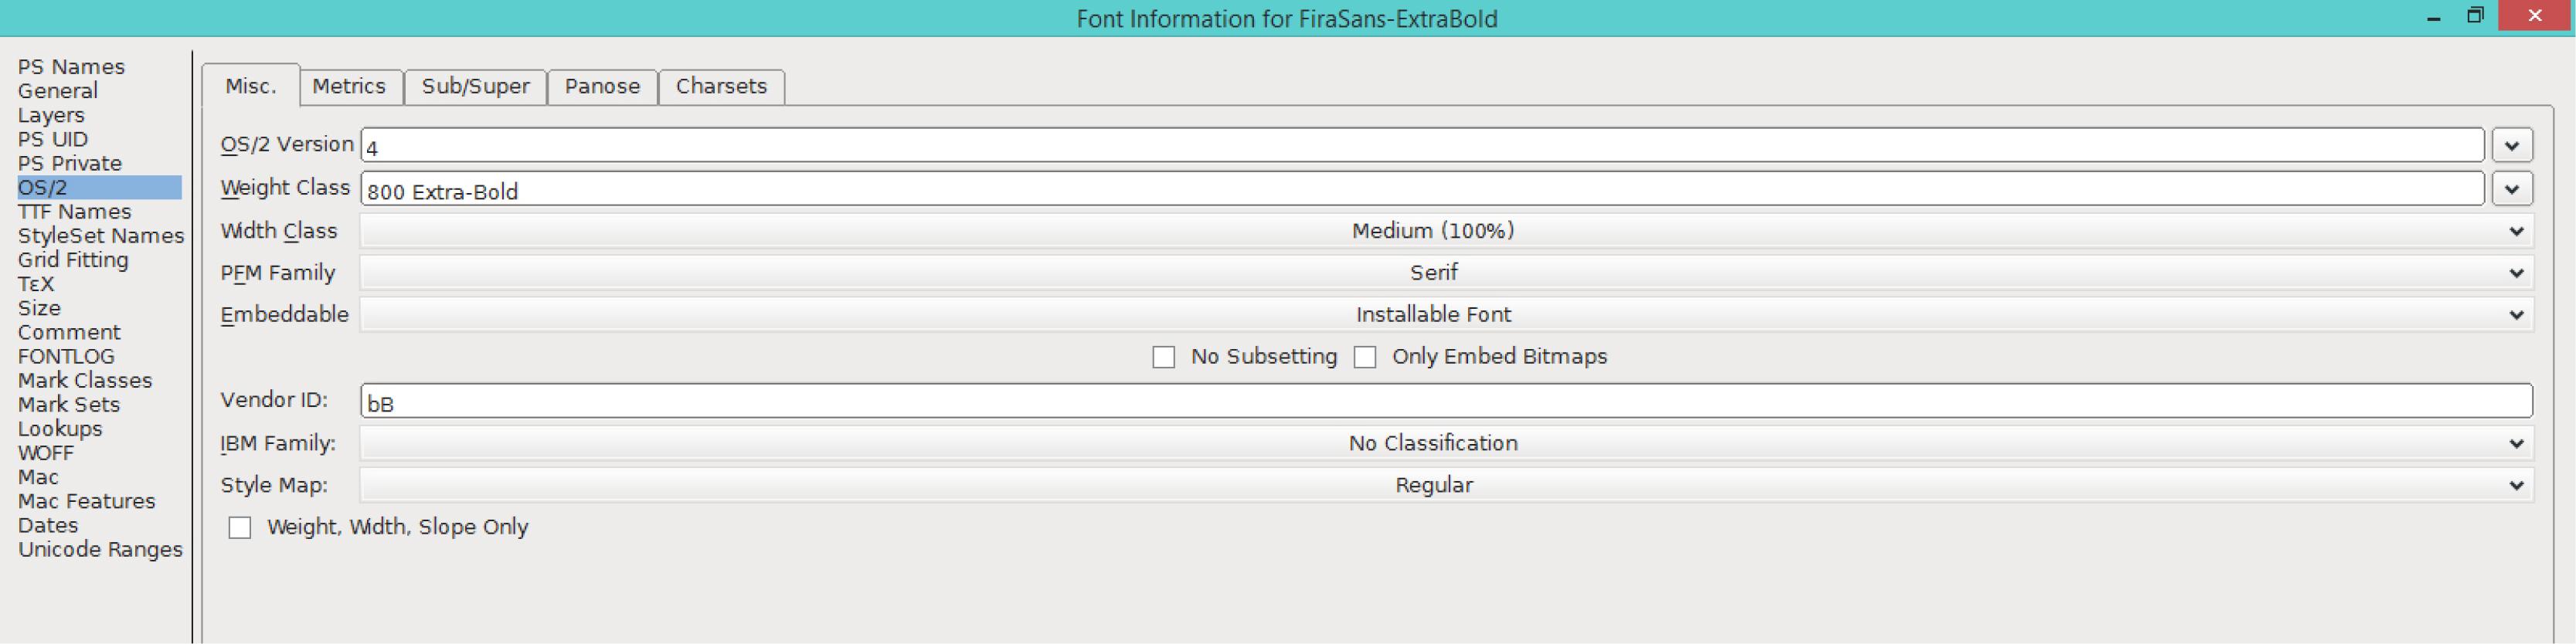 Fira Sans ExtraBold (OS/2)